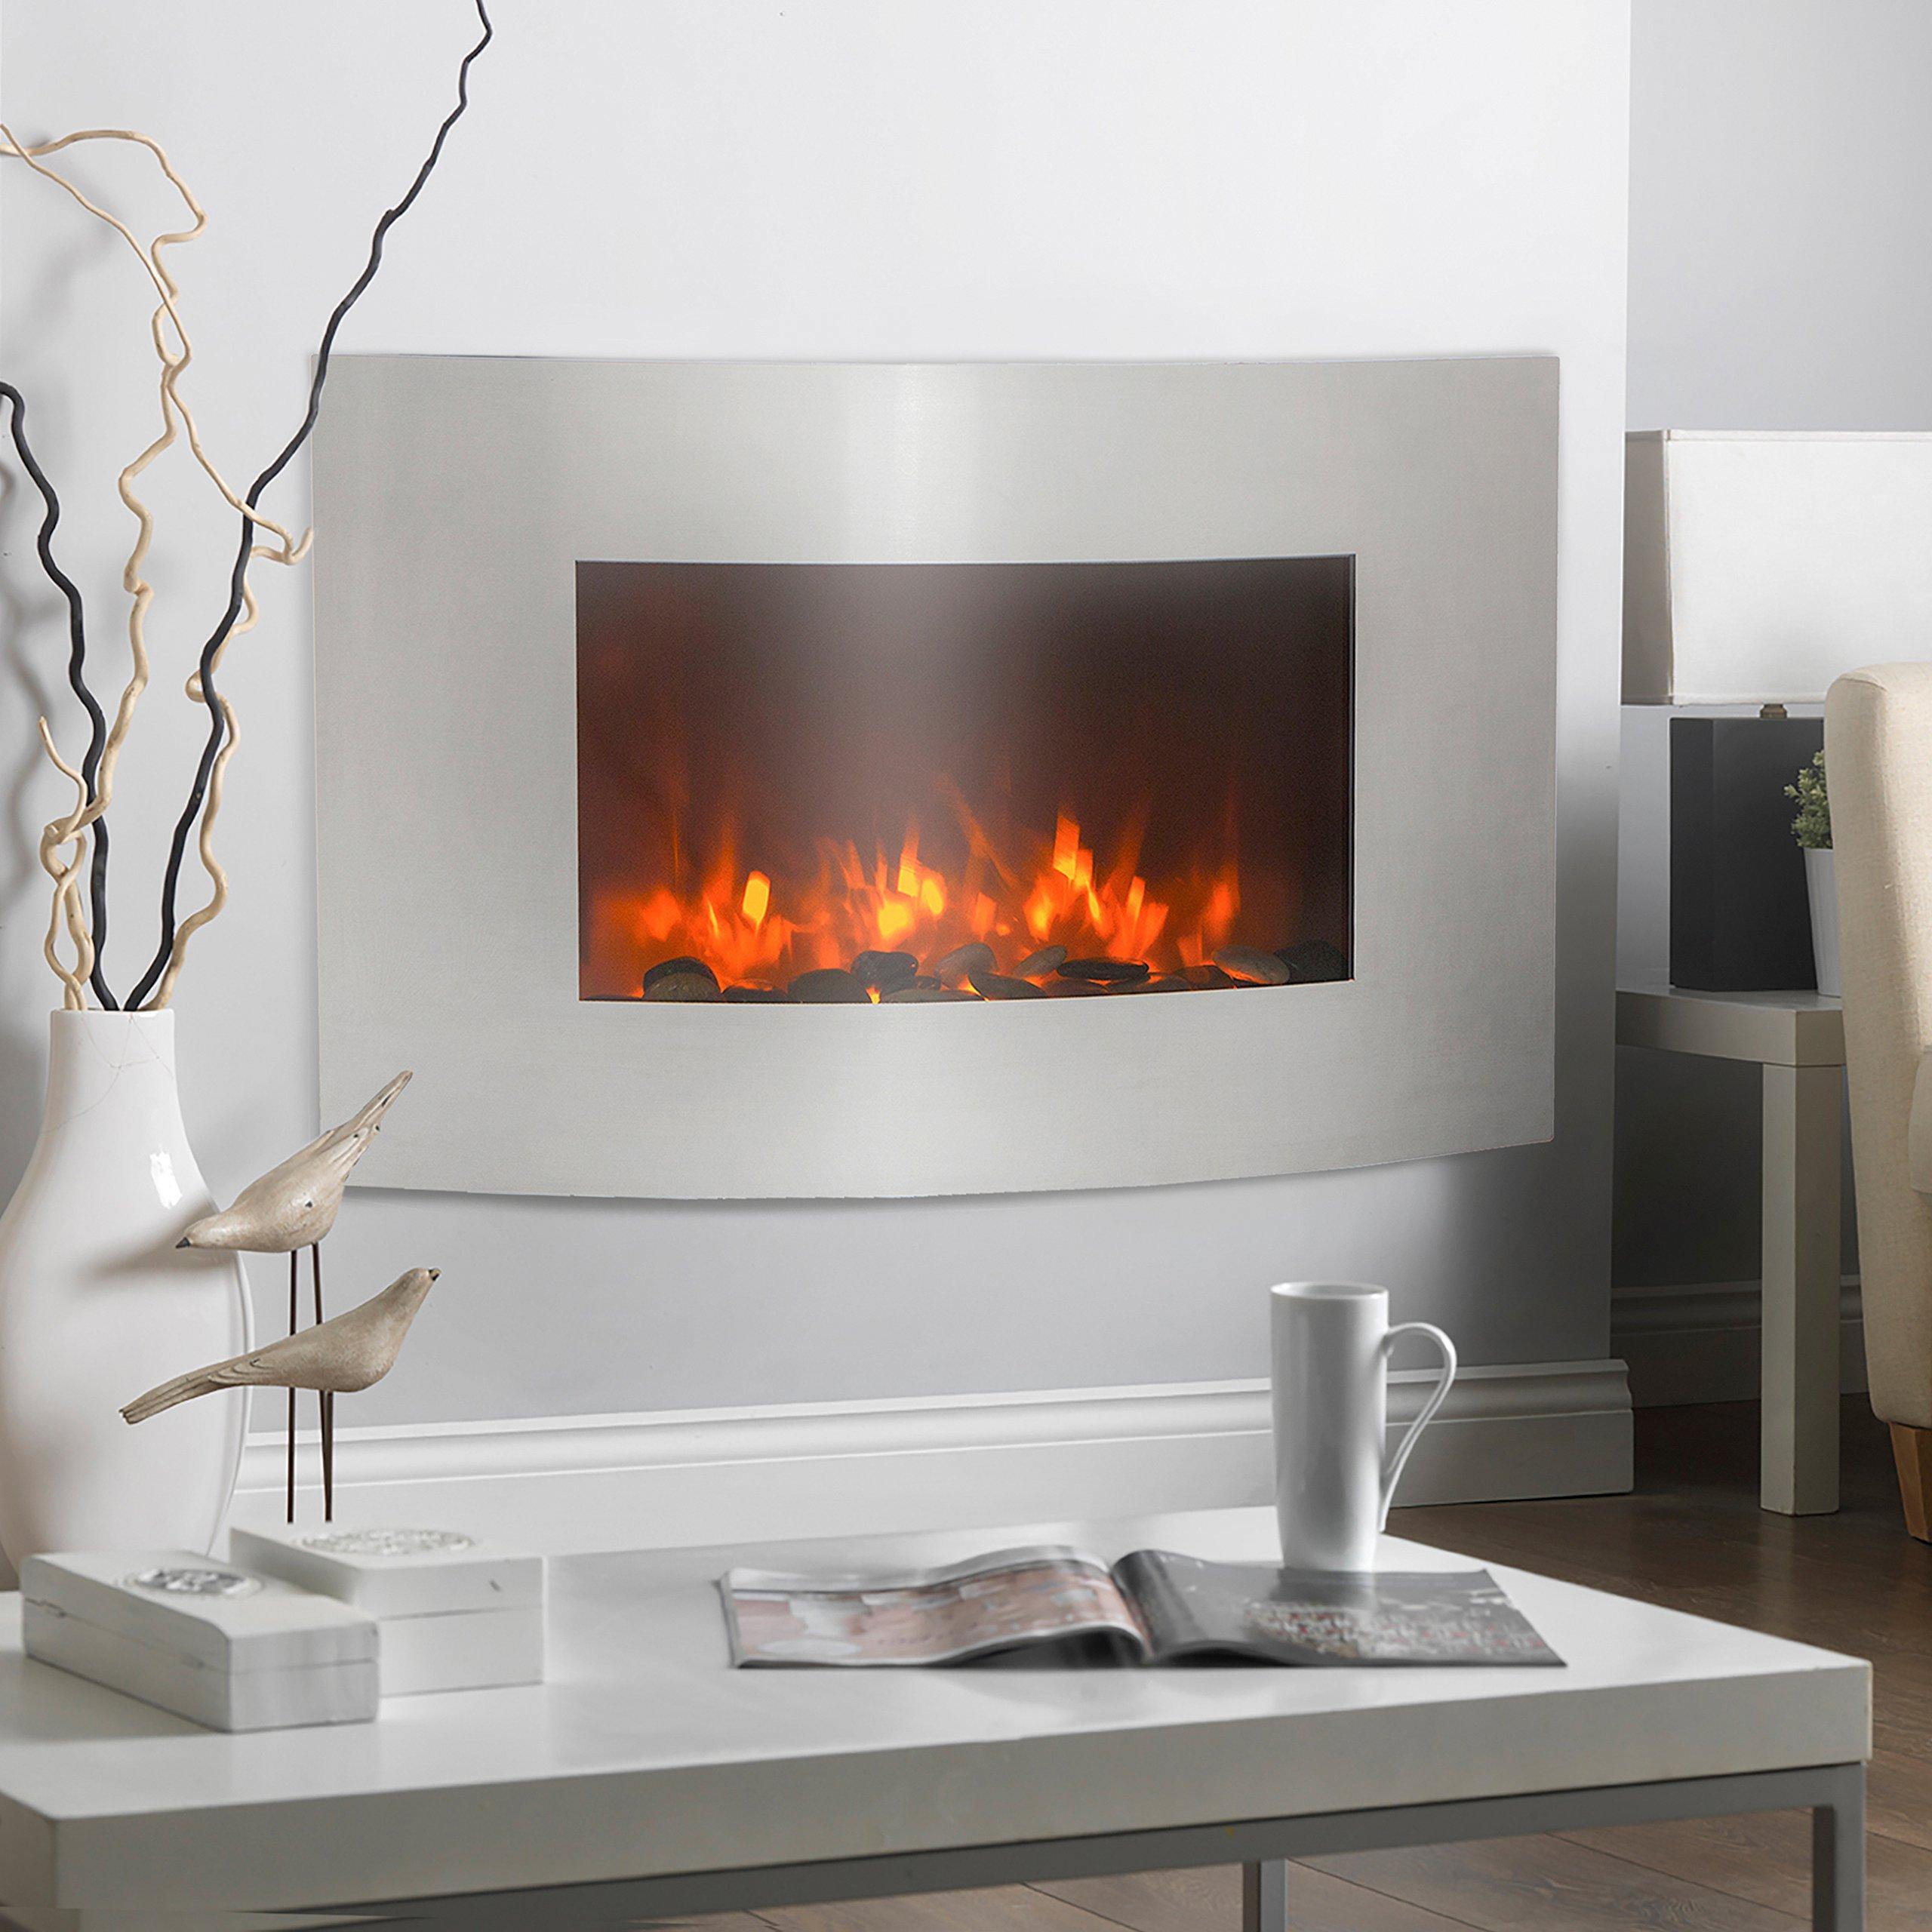 XtremepowerUS Stainless Steel Frame Wall Mount Heater Fireplace, Large 35'', 1500 Watt